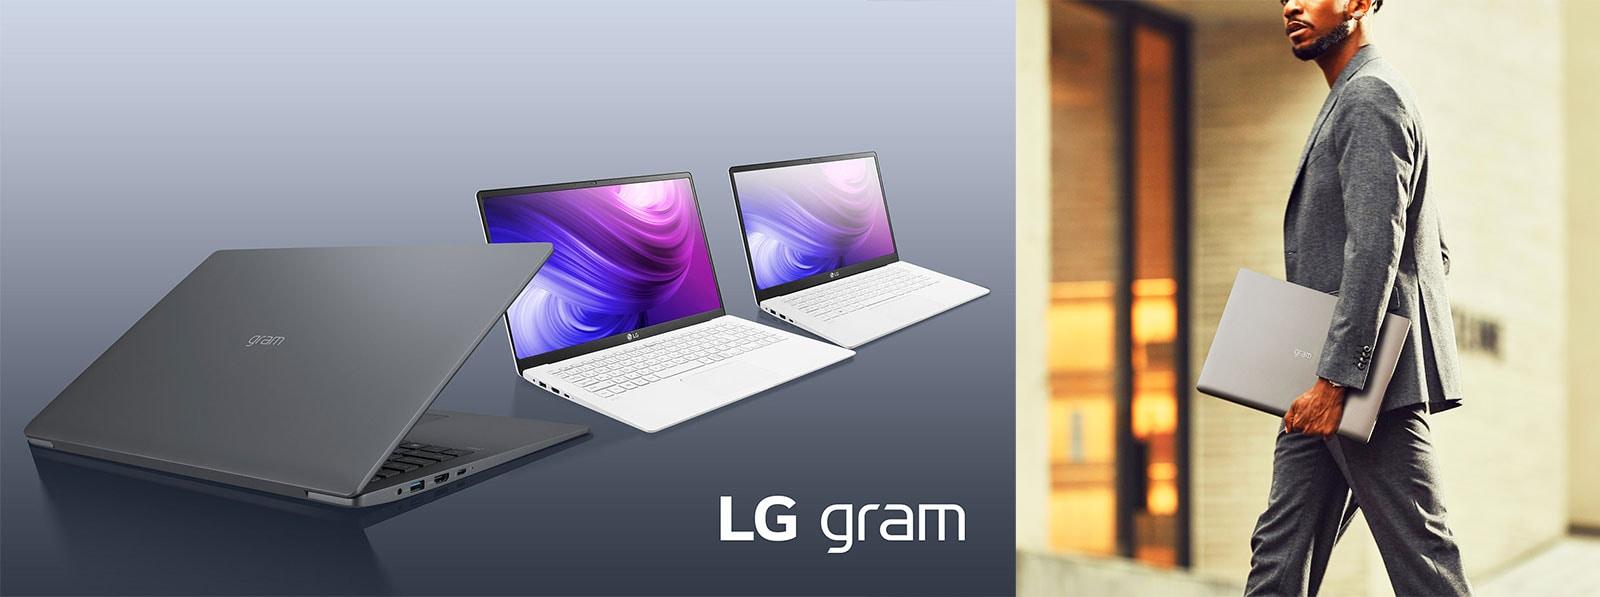 『LG gram』2019年モデル